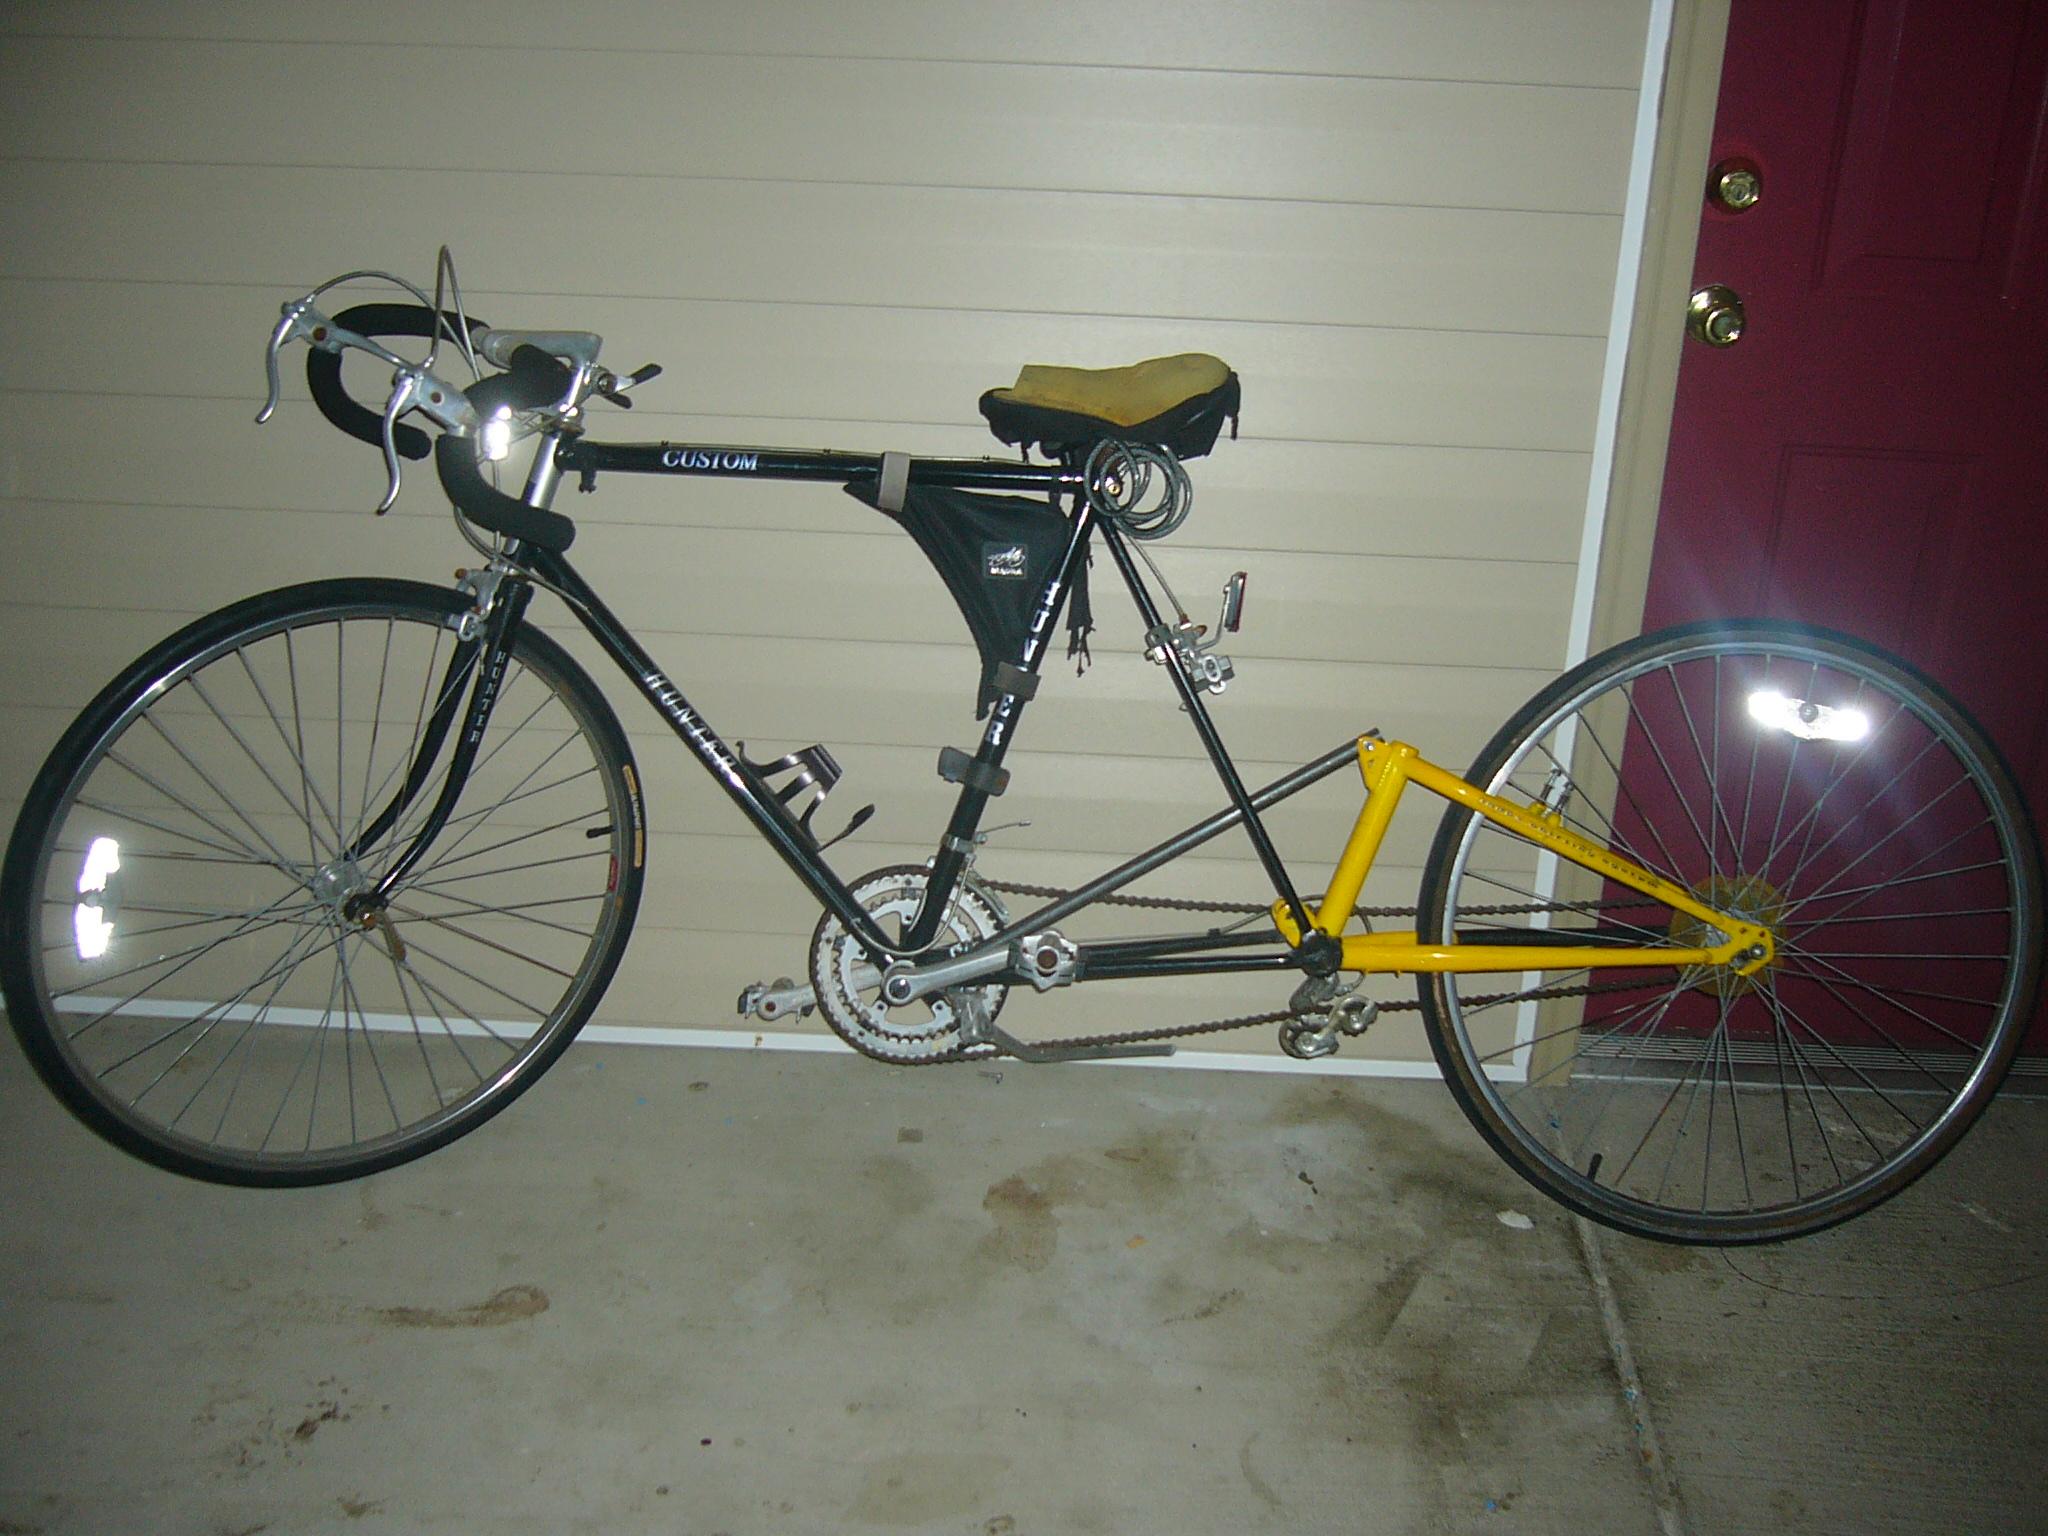 Homemade Sport Utility Bike (SUB)